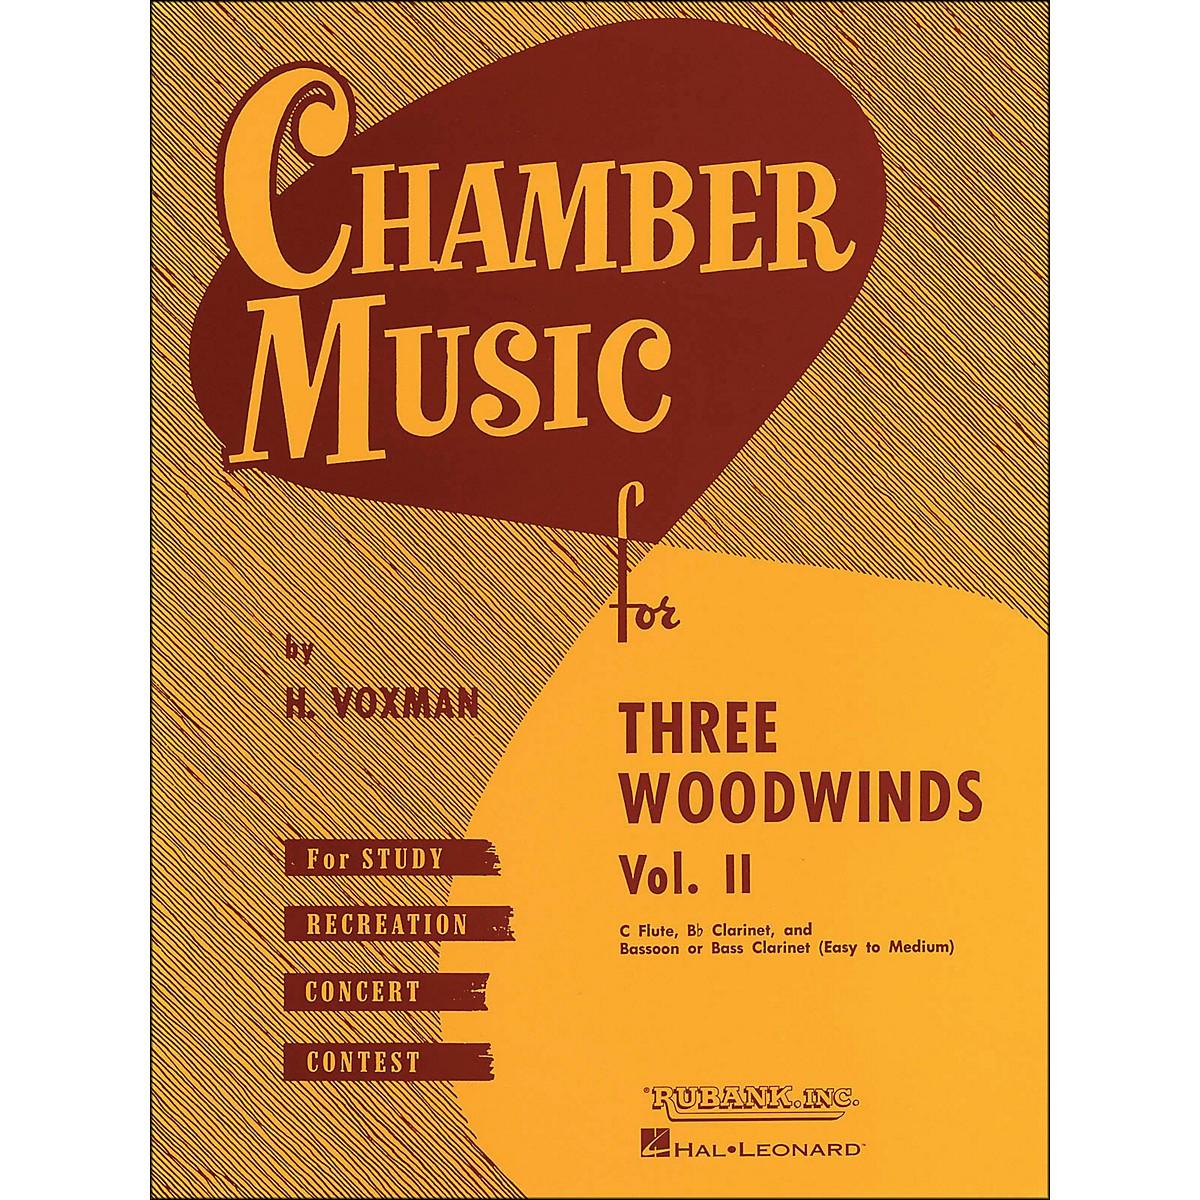 Hal Leonard Chamber Music for Three Woodwinds Vol. 2 Easy To Medium Flute/Clarinet/Bassoon/Or Bass Clarinet